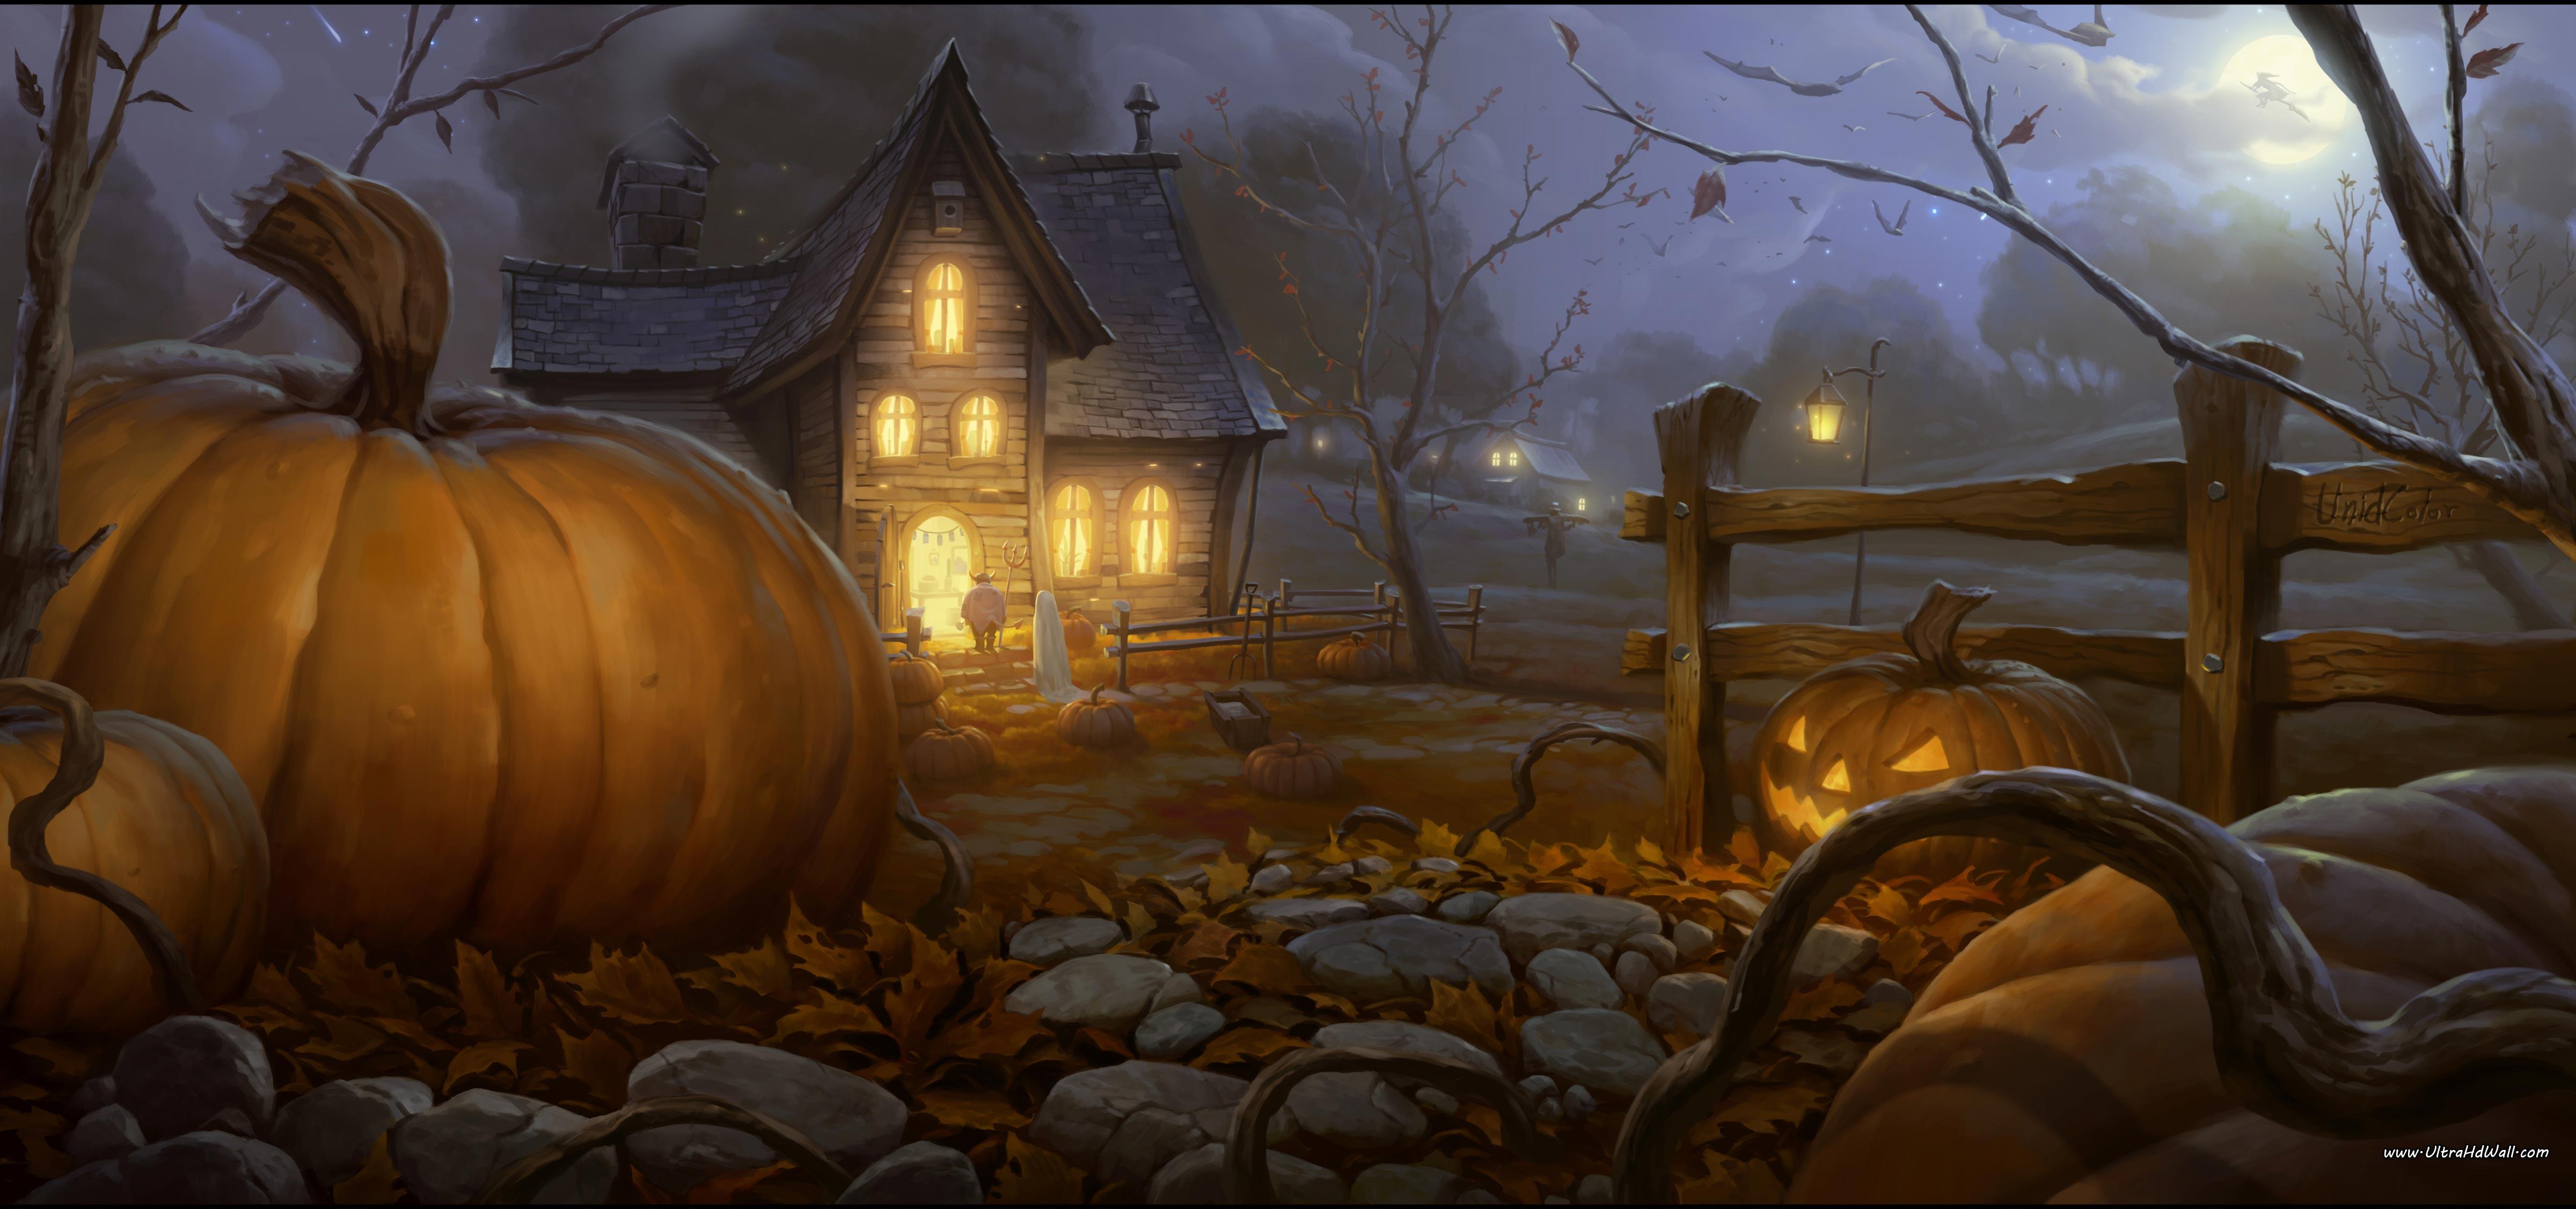 Desktop Halloween Wallpaper - WallpaperSafari